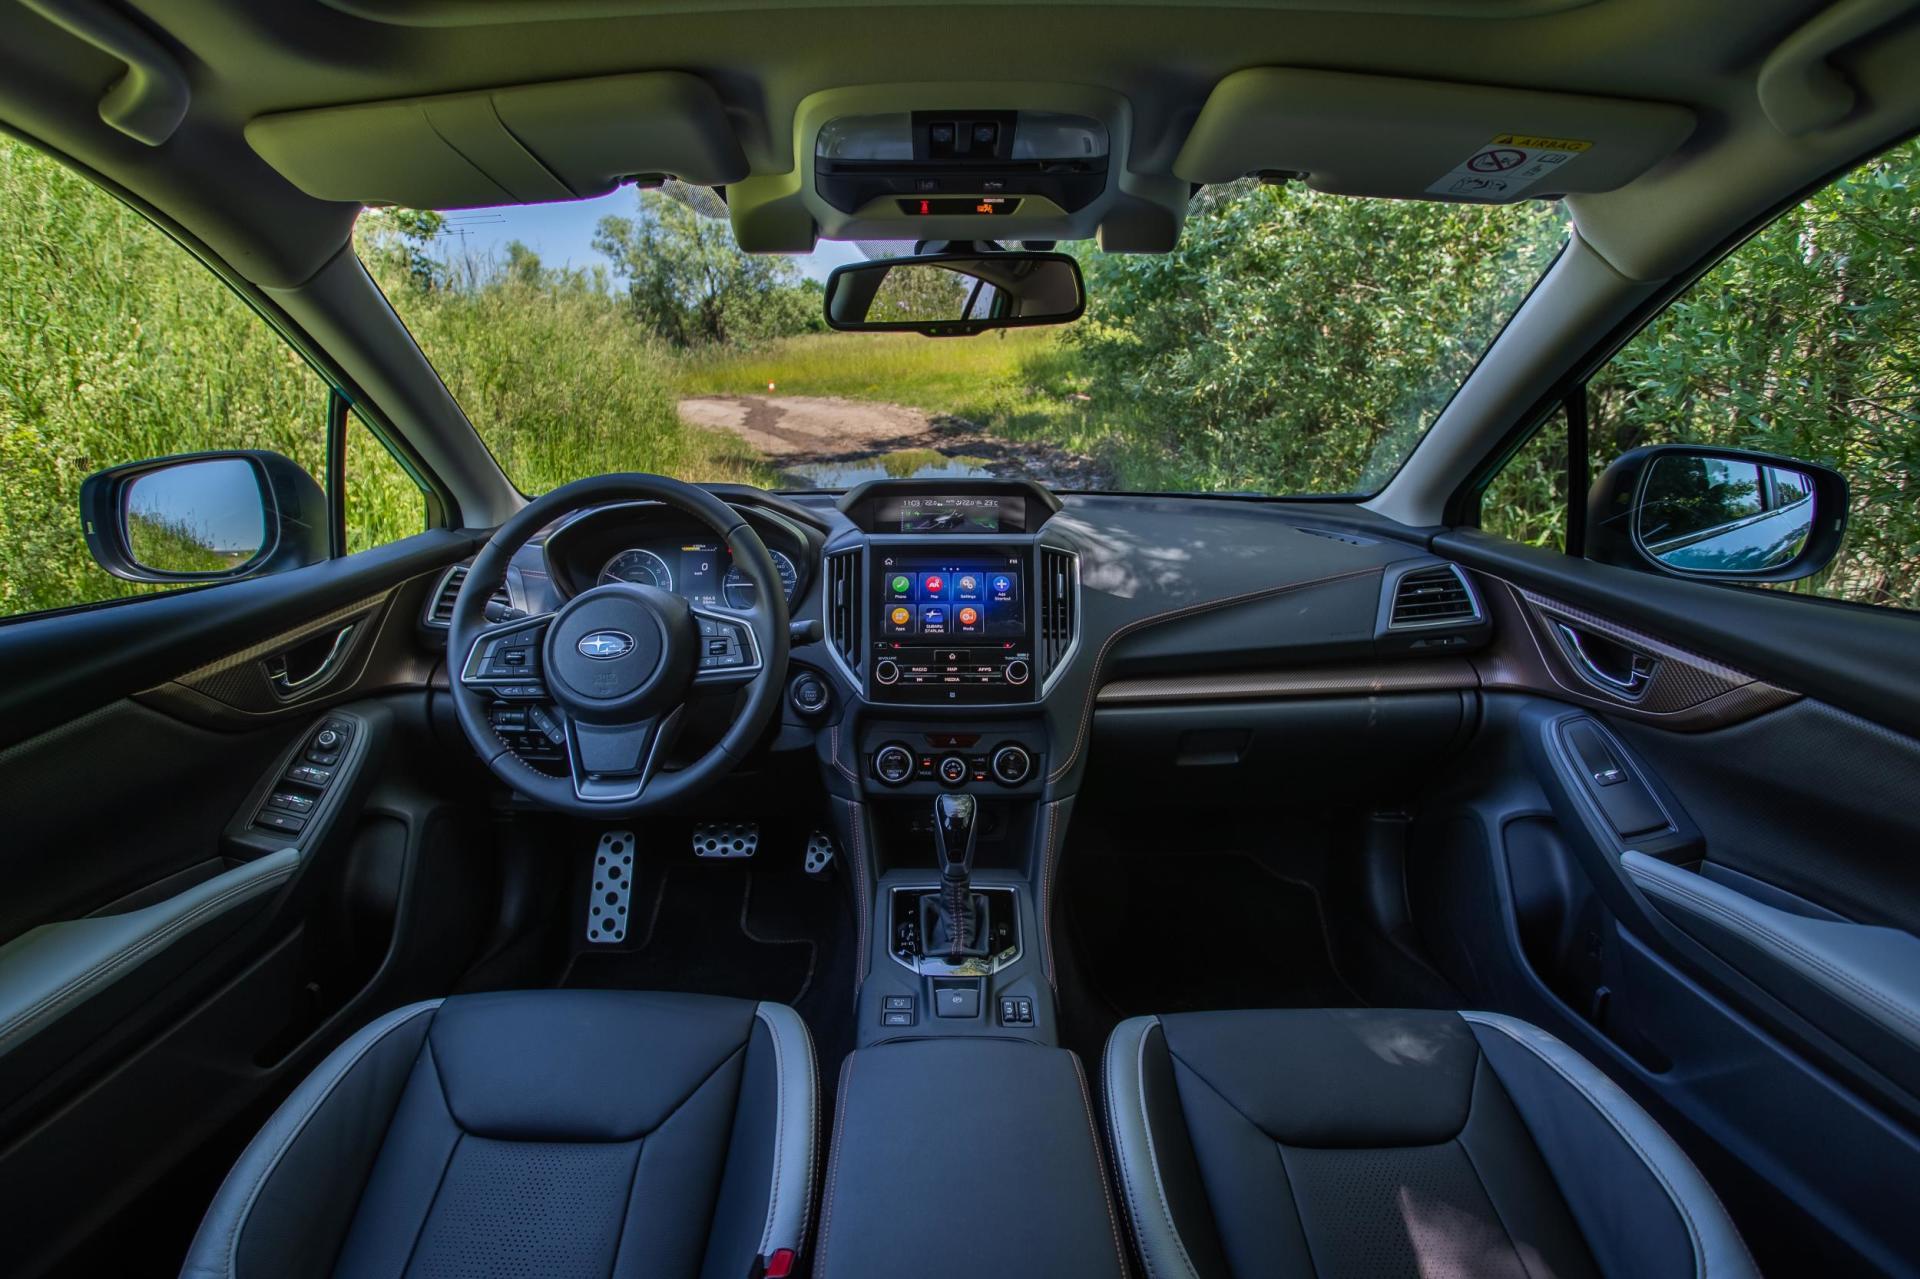 Subaru Xv Hibrido Precio Dm 5